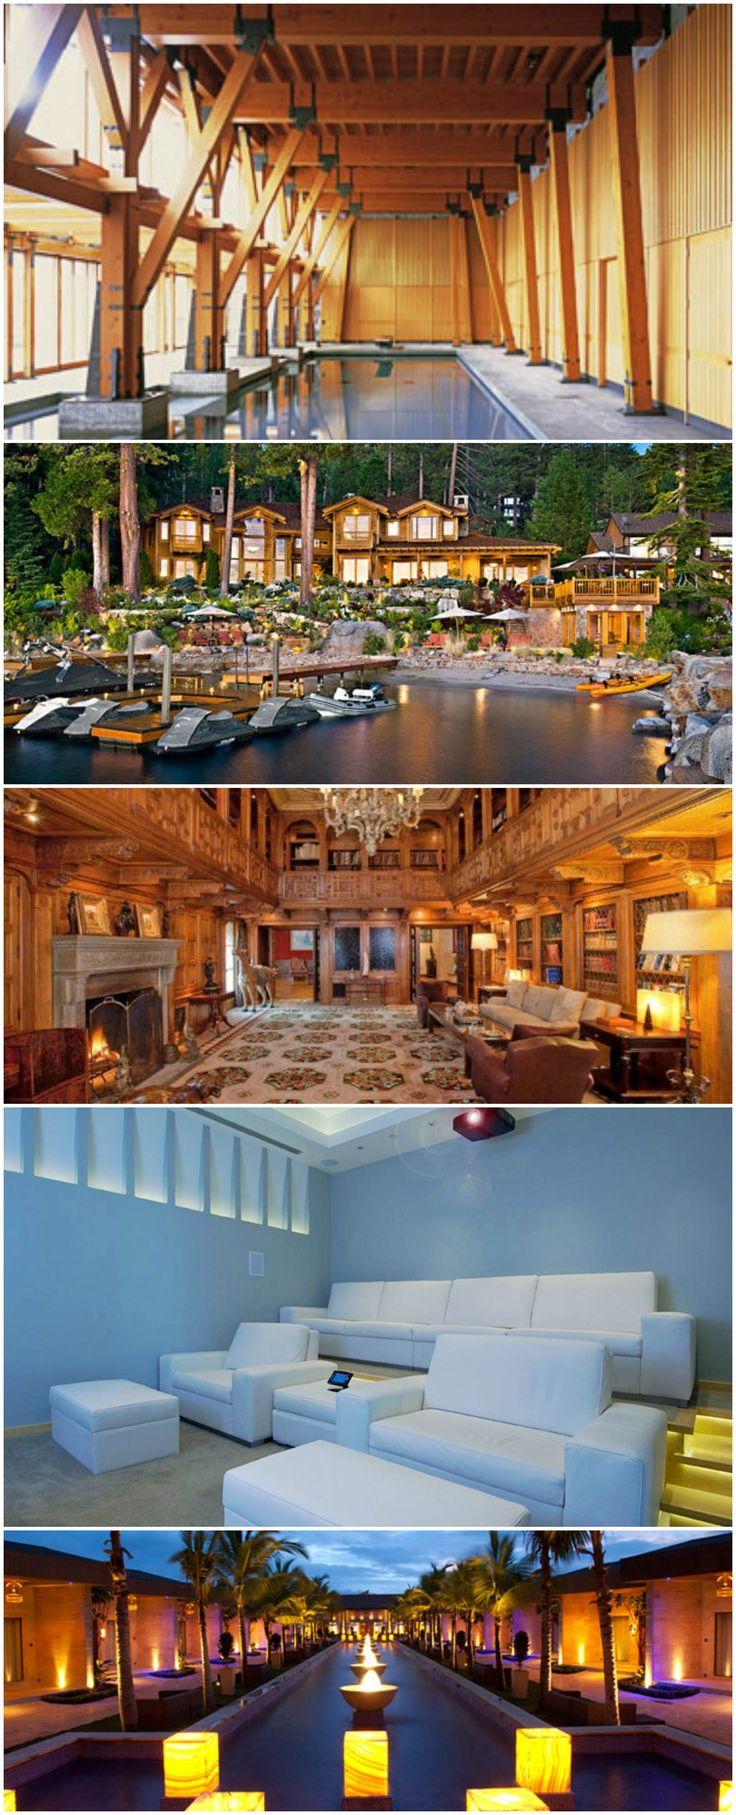 Luxurious House of Bill Gates Xanadu 2.0 | Facebook, Bill gates ...